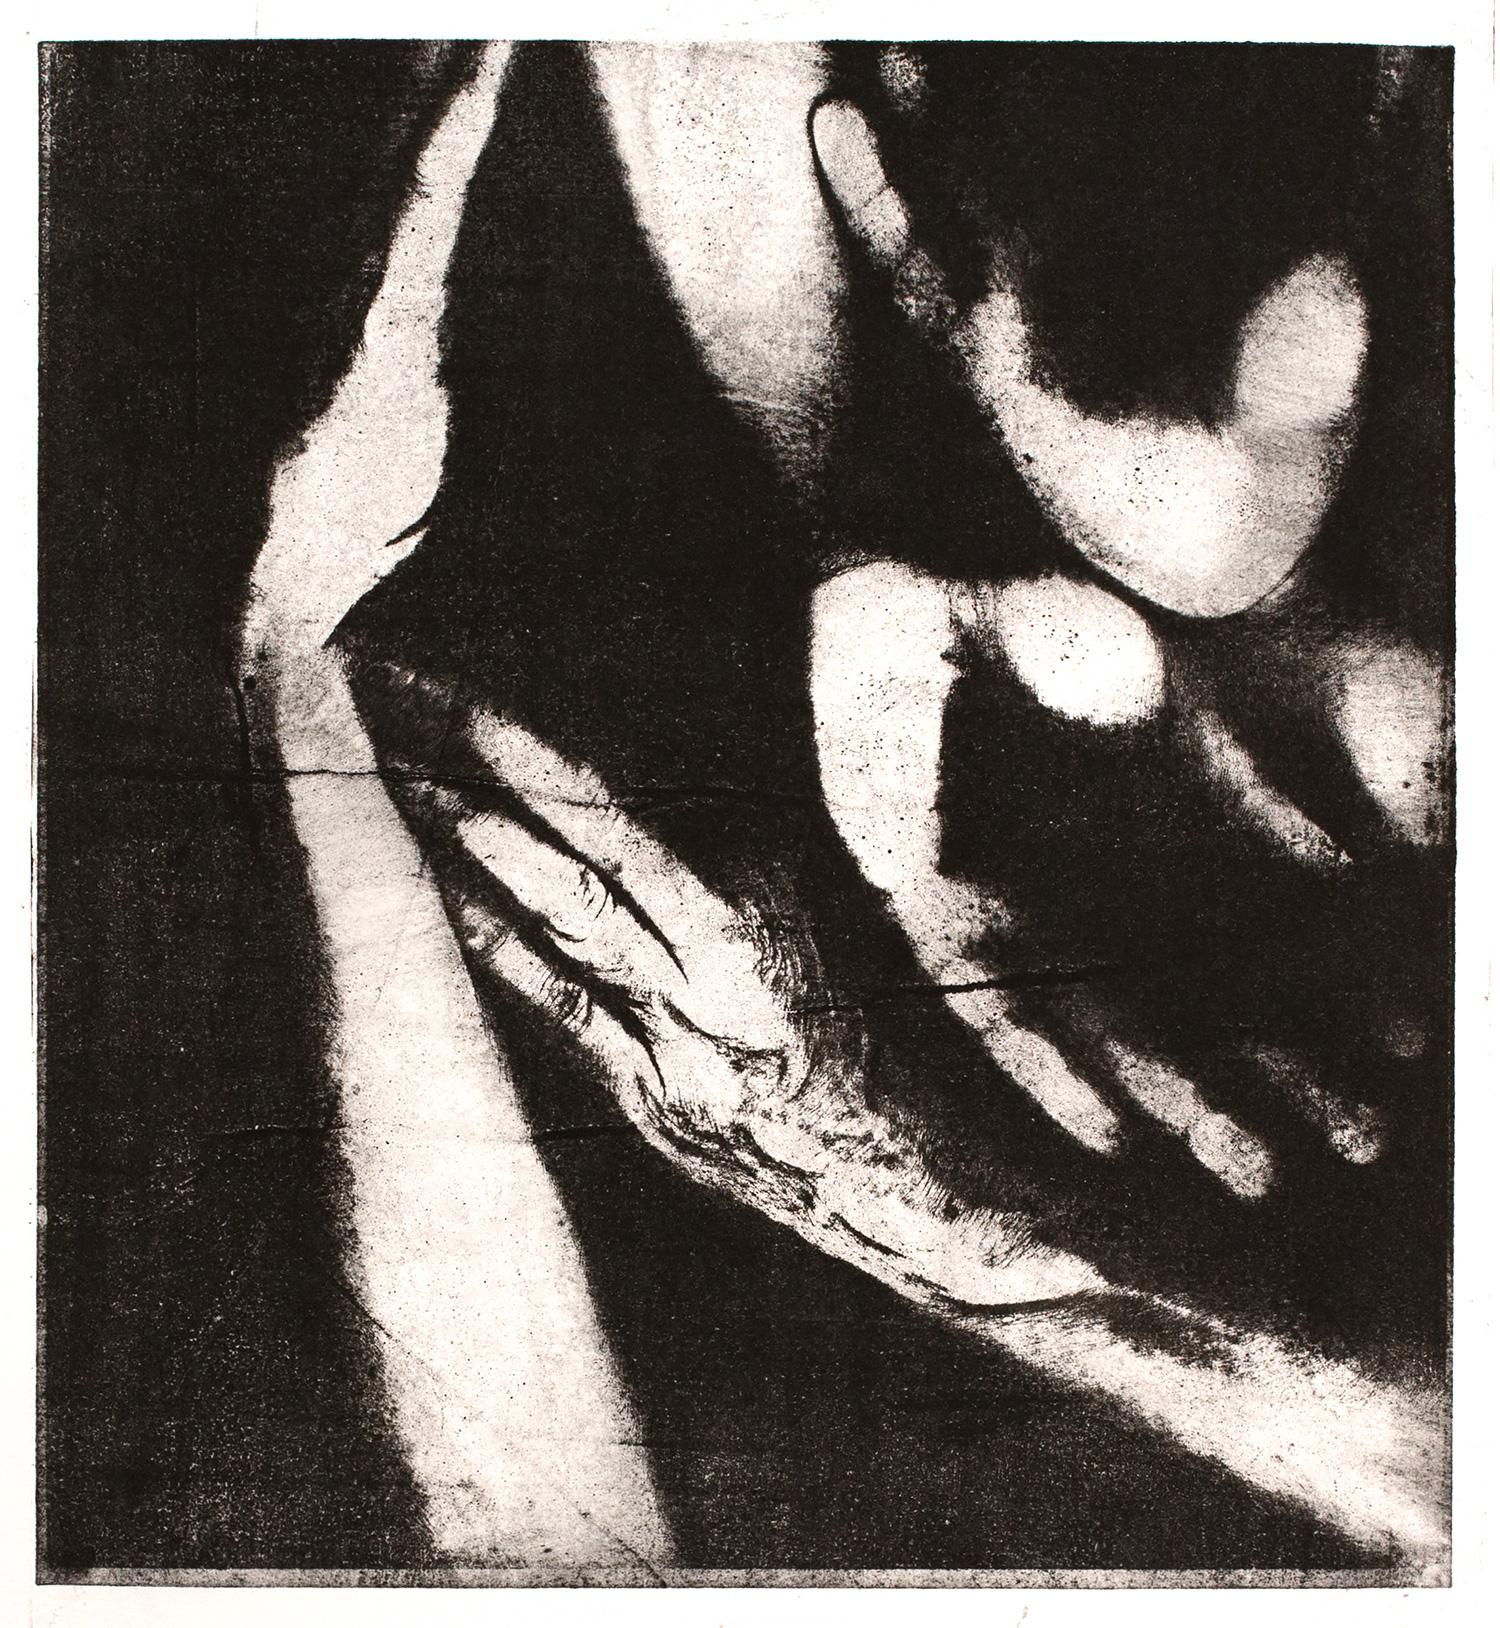 Study I , 2016, paper lithograph on Fabriano Artistico 300 gsm, 42 x 29.7 cm